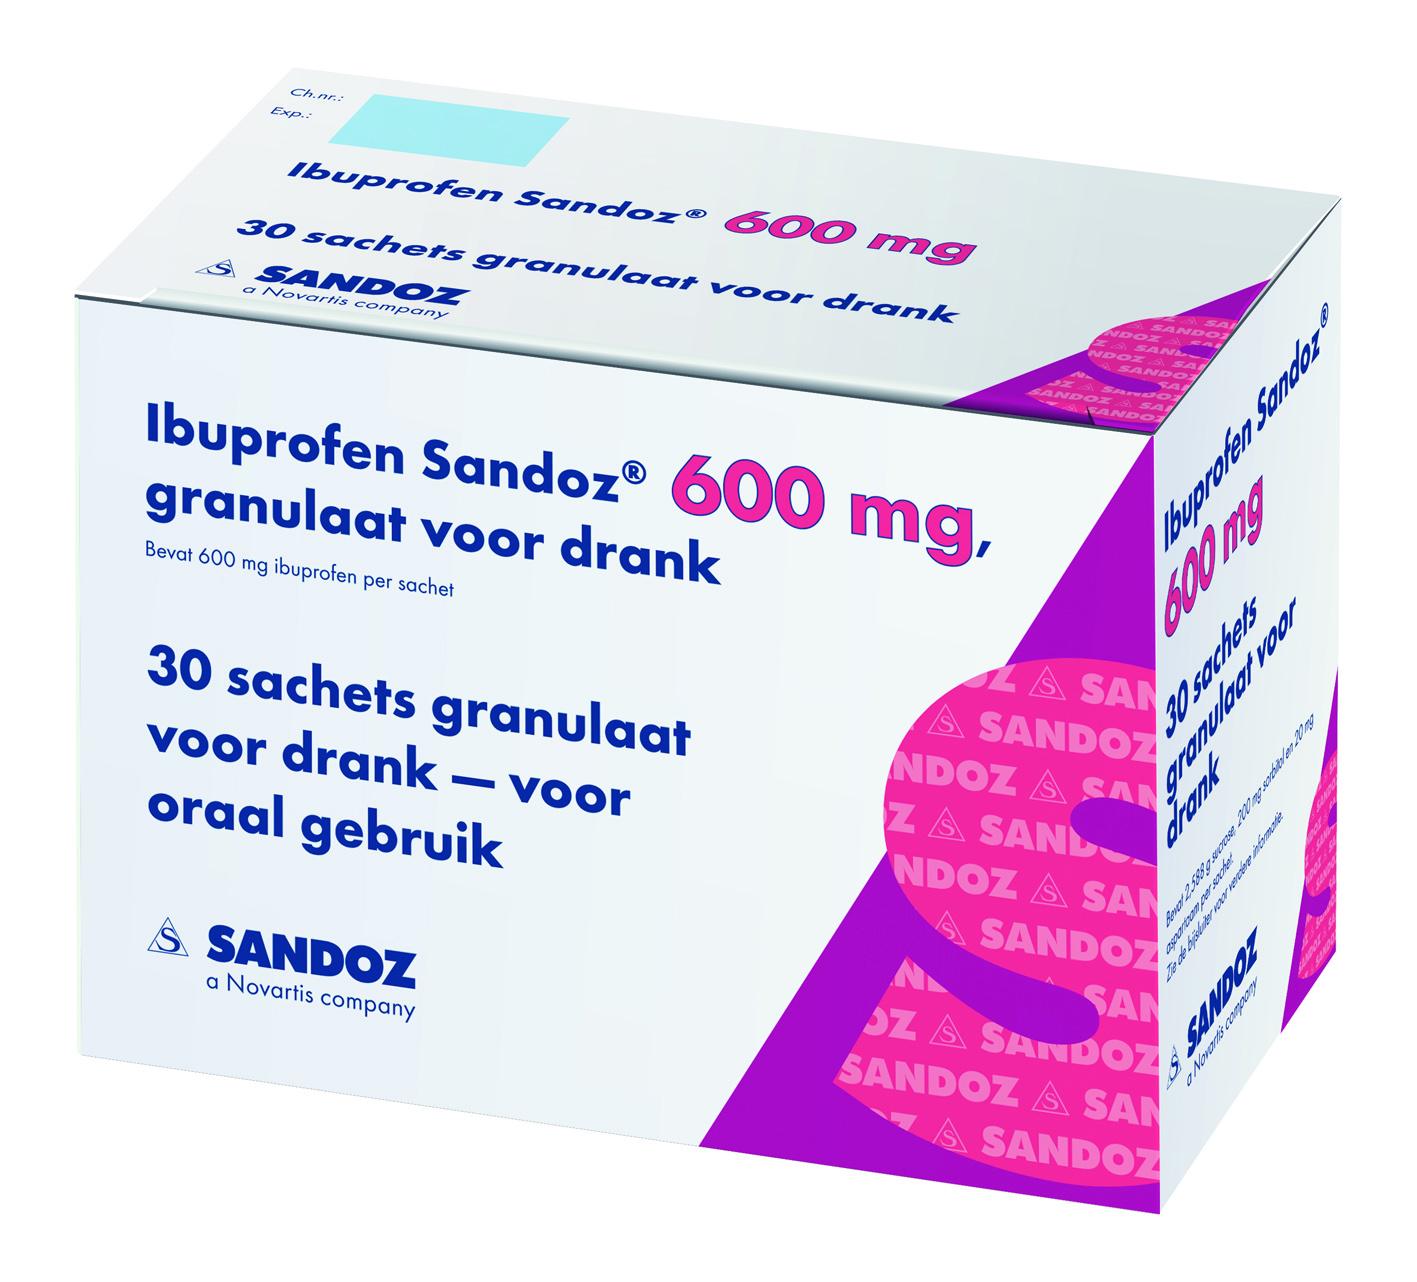 ibuprofen-sandoz-600